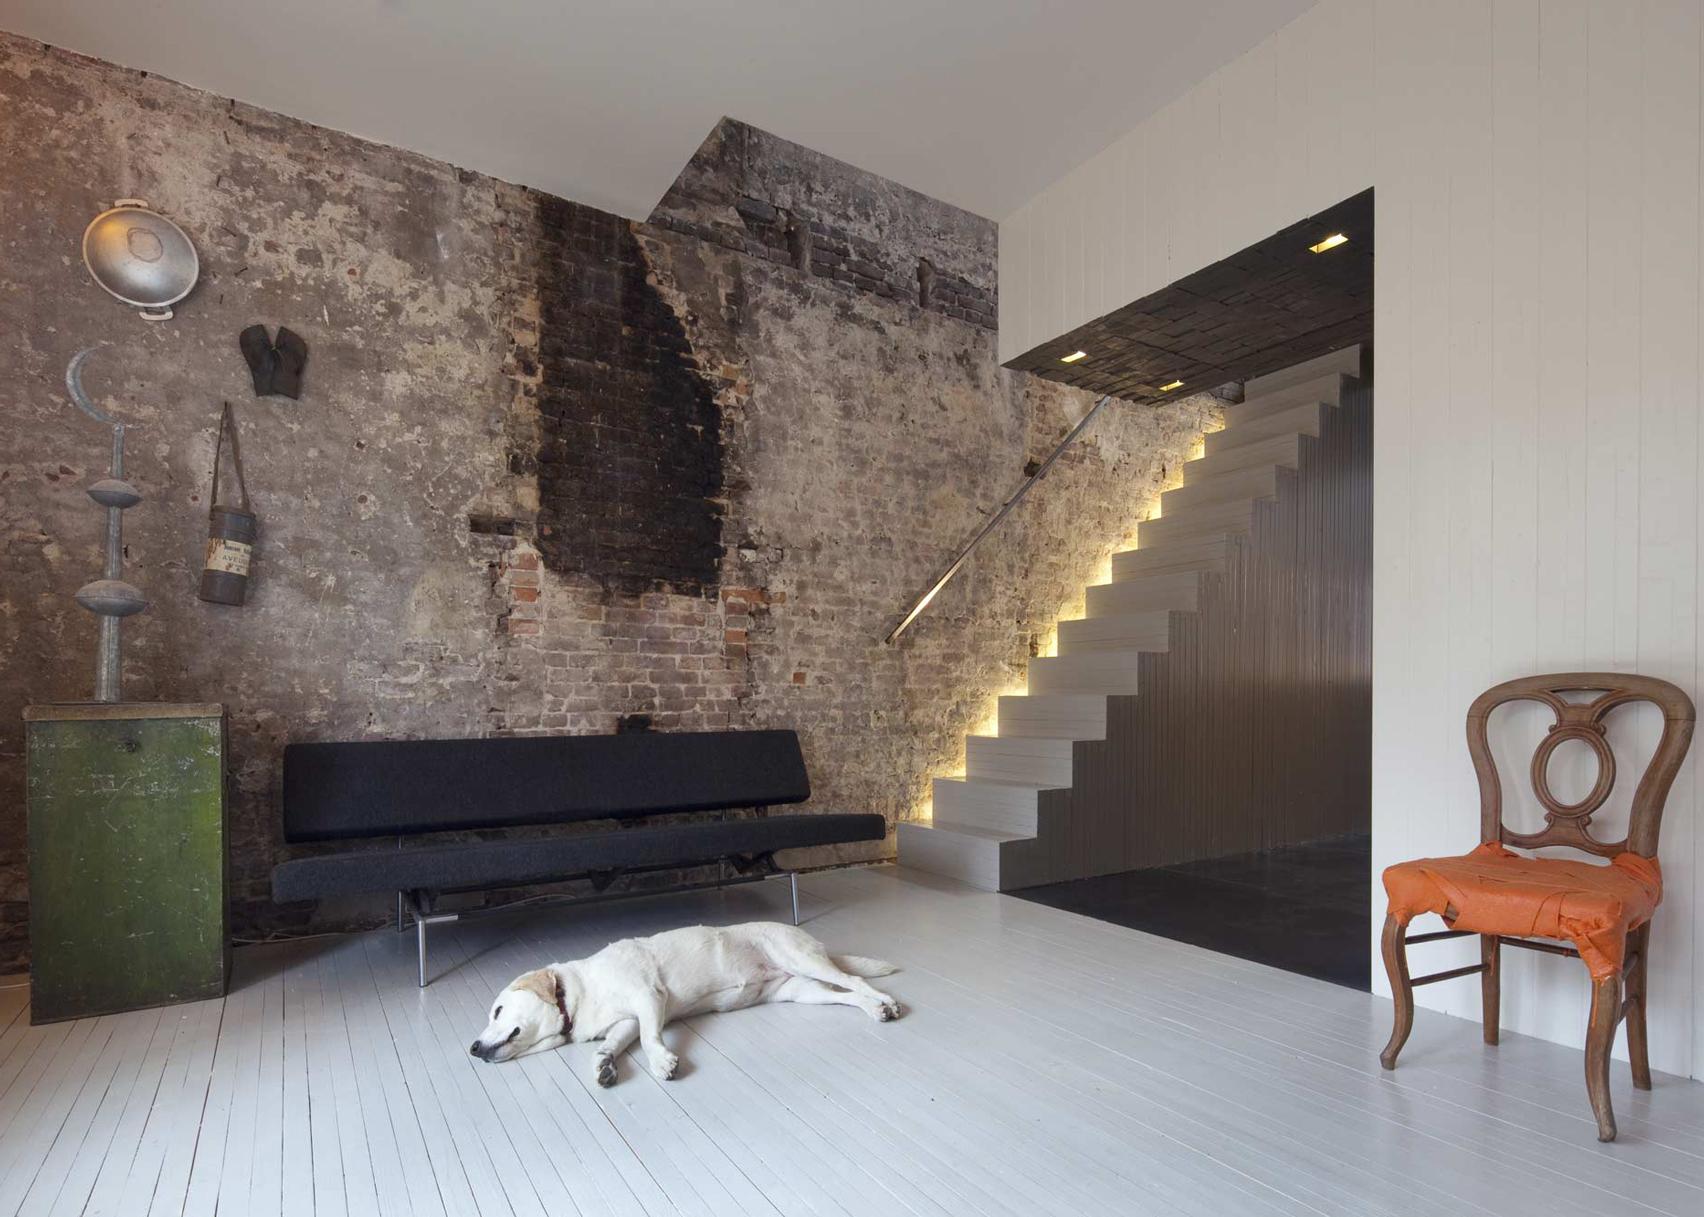 Black Pearl Rotterdam townhouse on the top 10 brick interiors on Dezeen's Pinterest boards